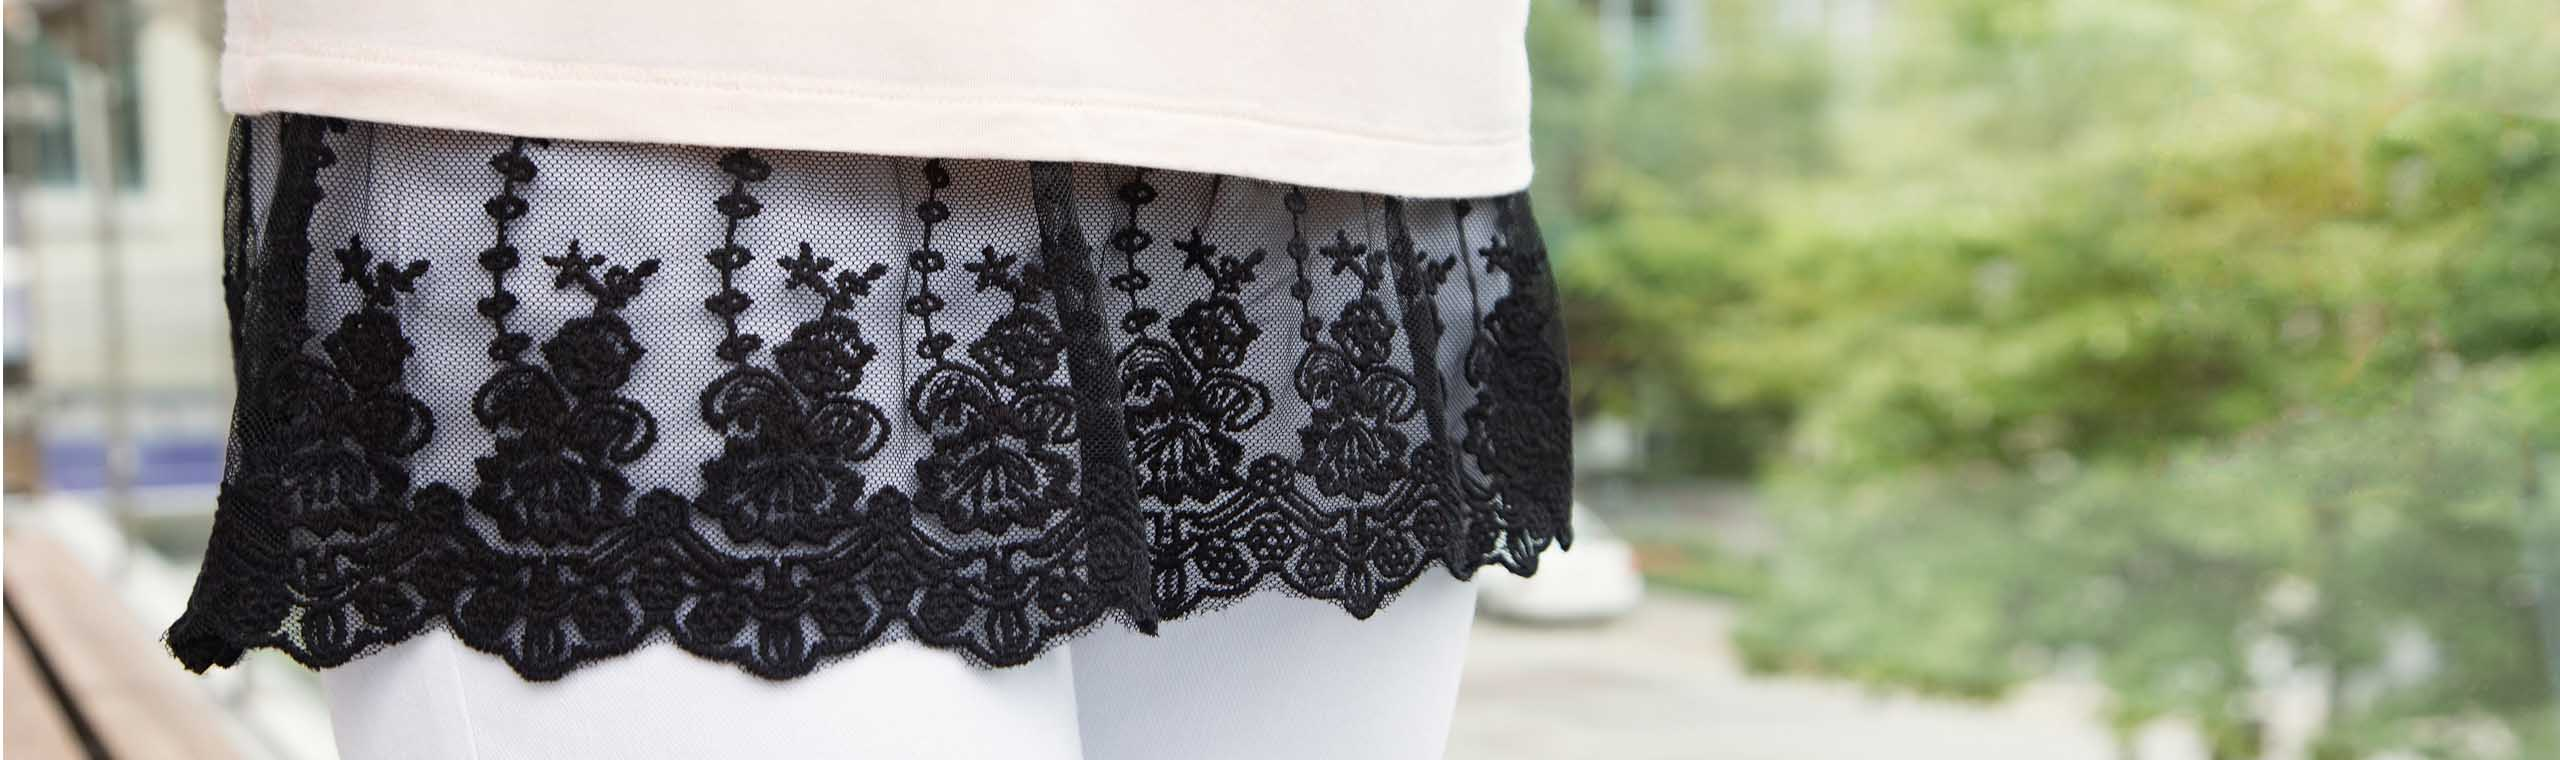 Woman wearing shirt with black lace along bottom edge